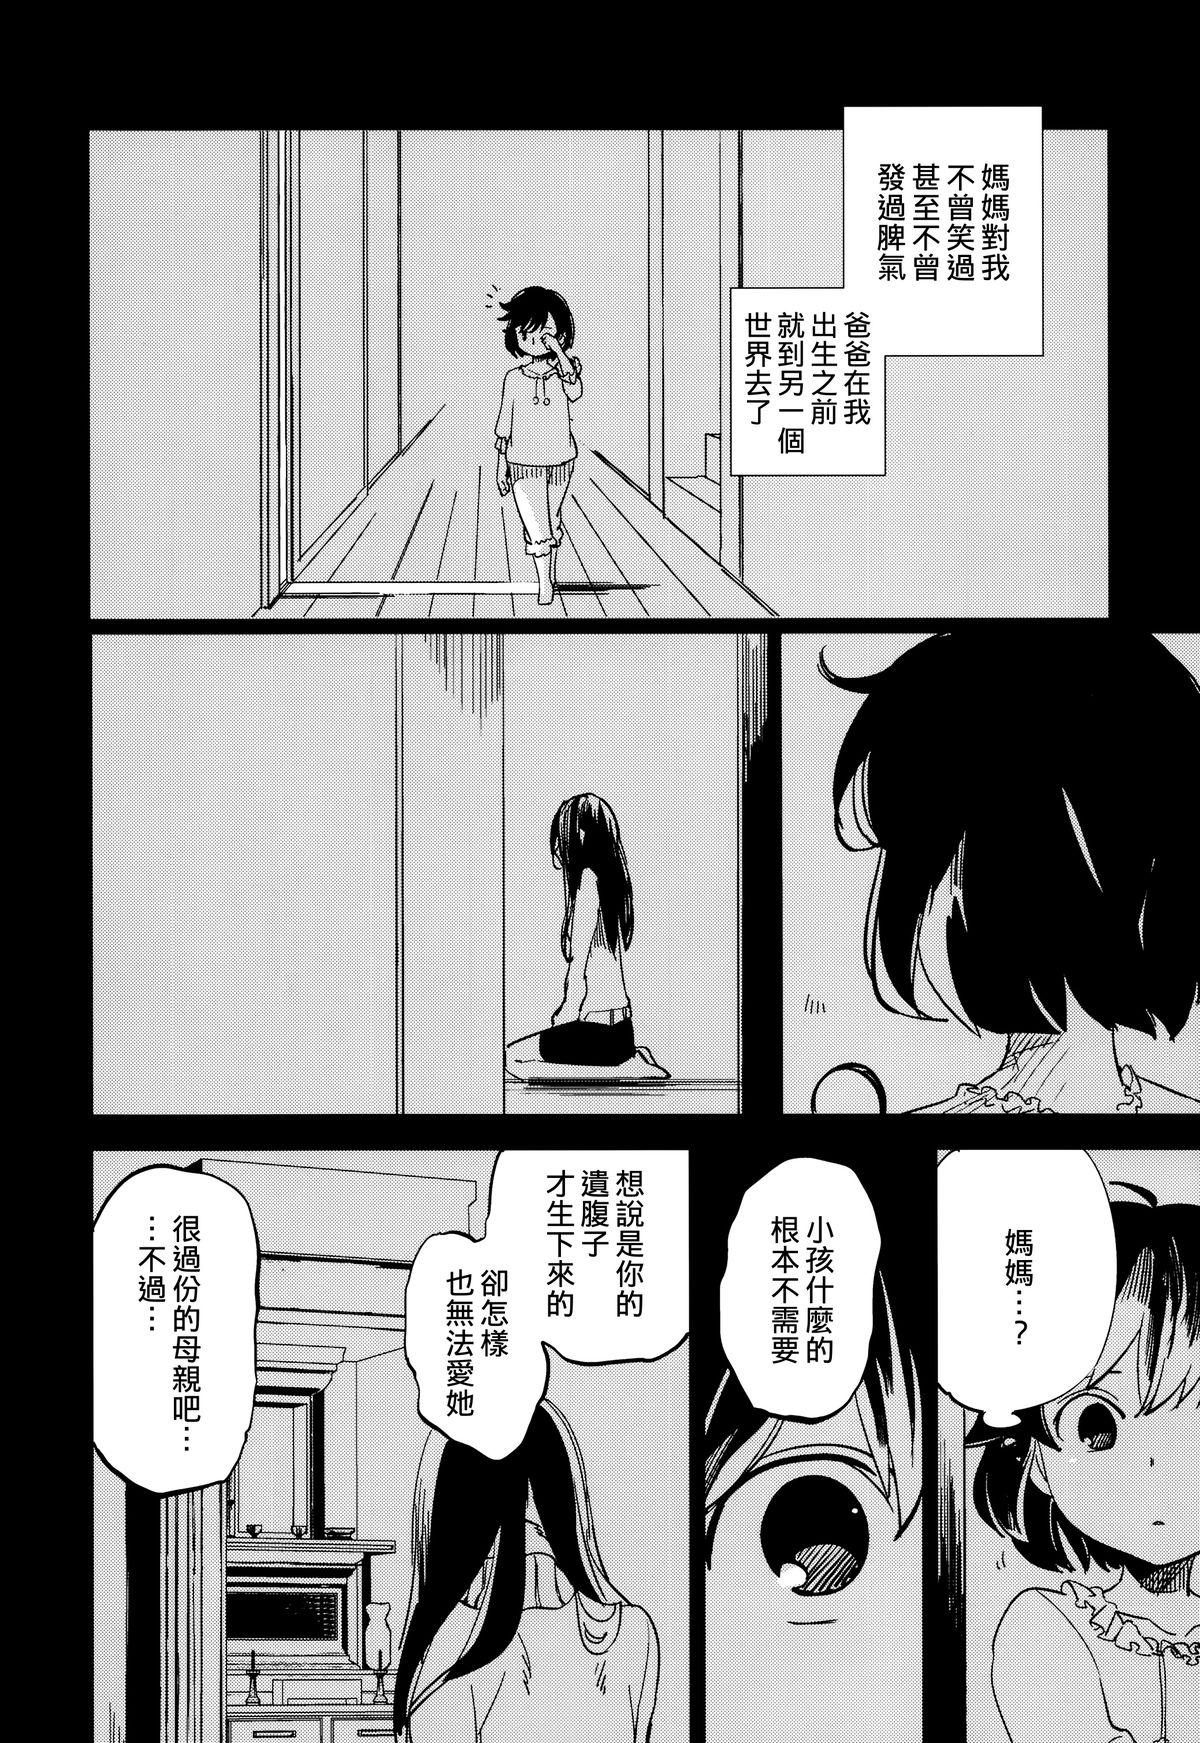 Yojo-han Bunny Part 4 11